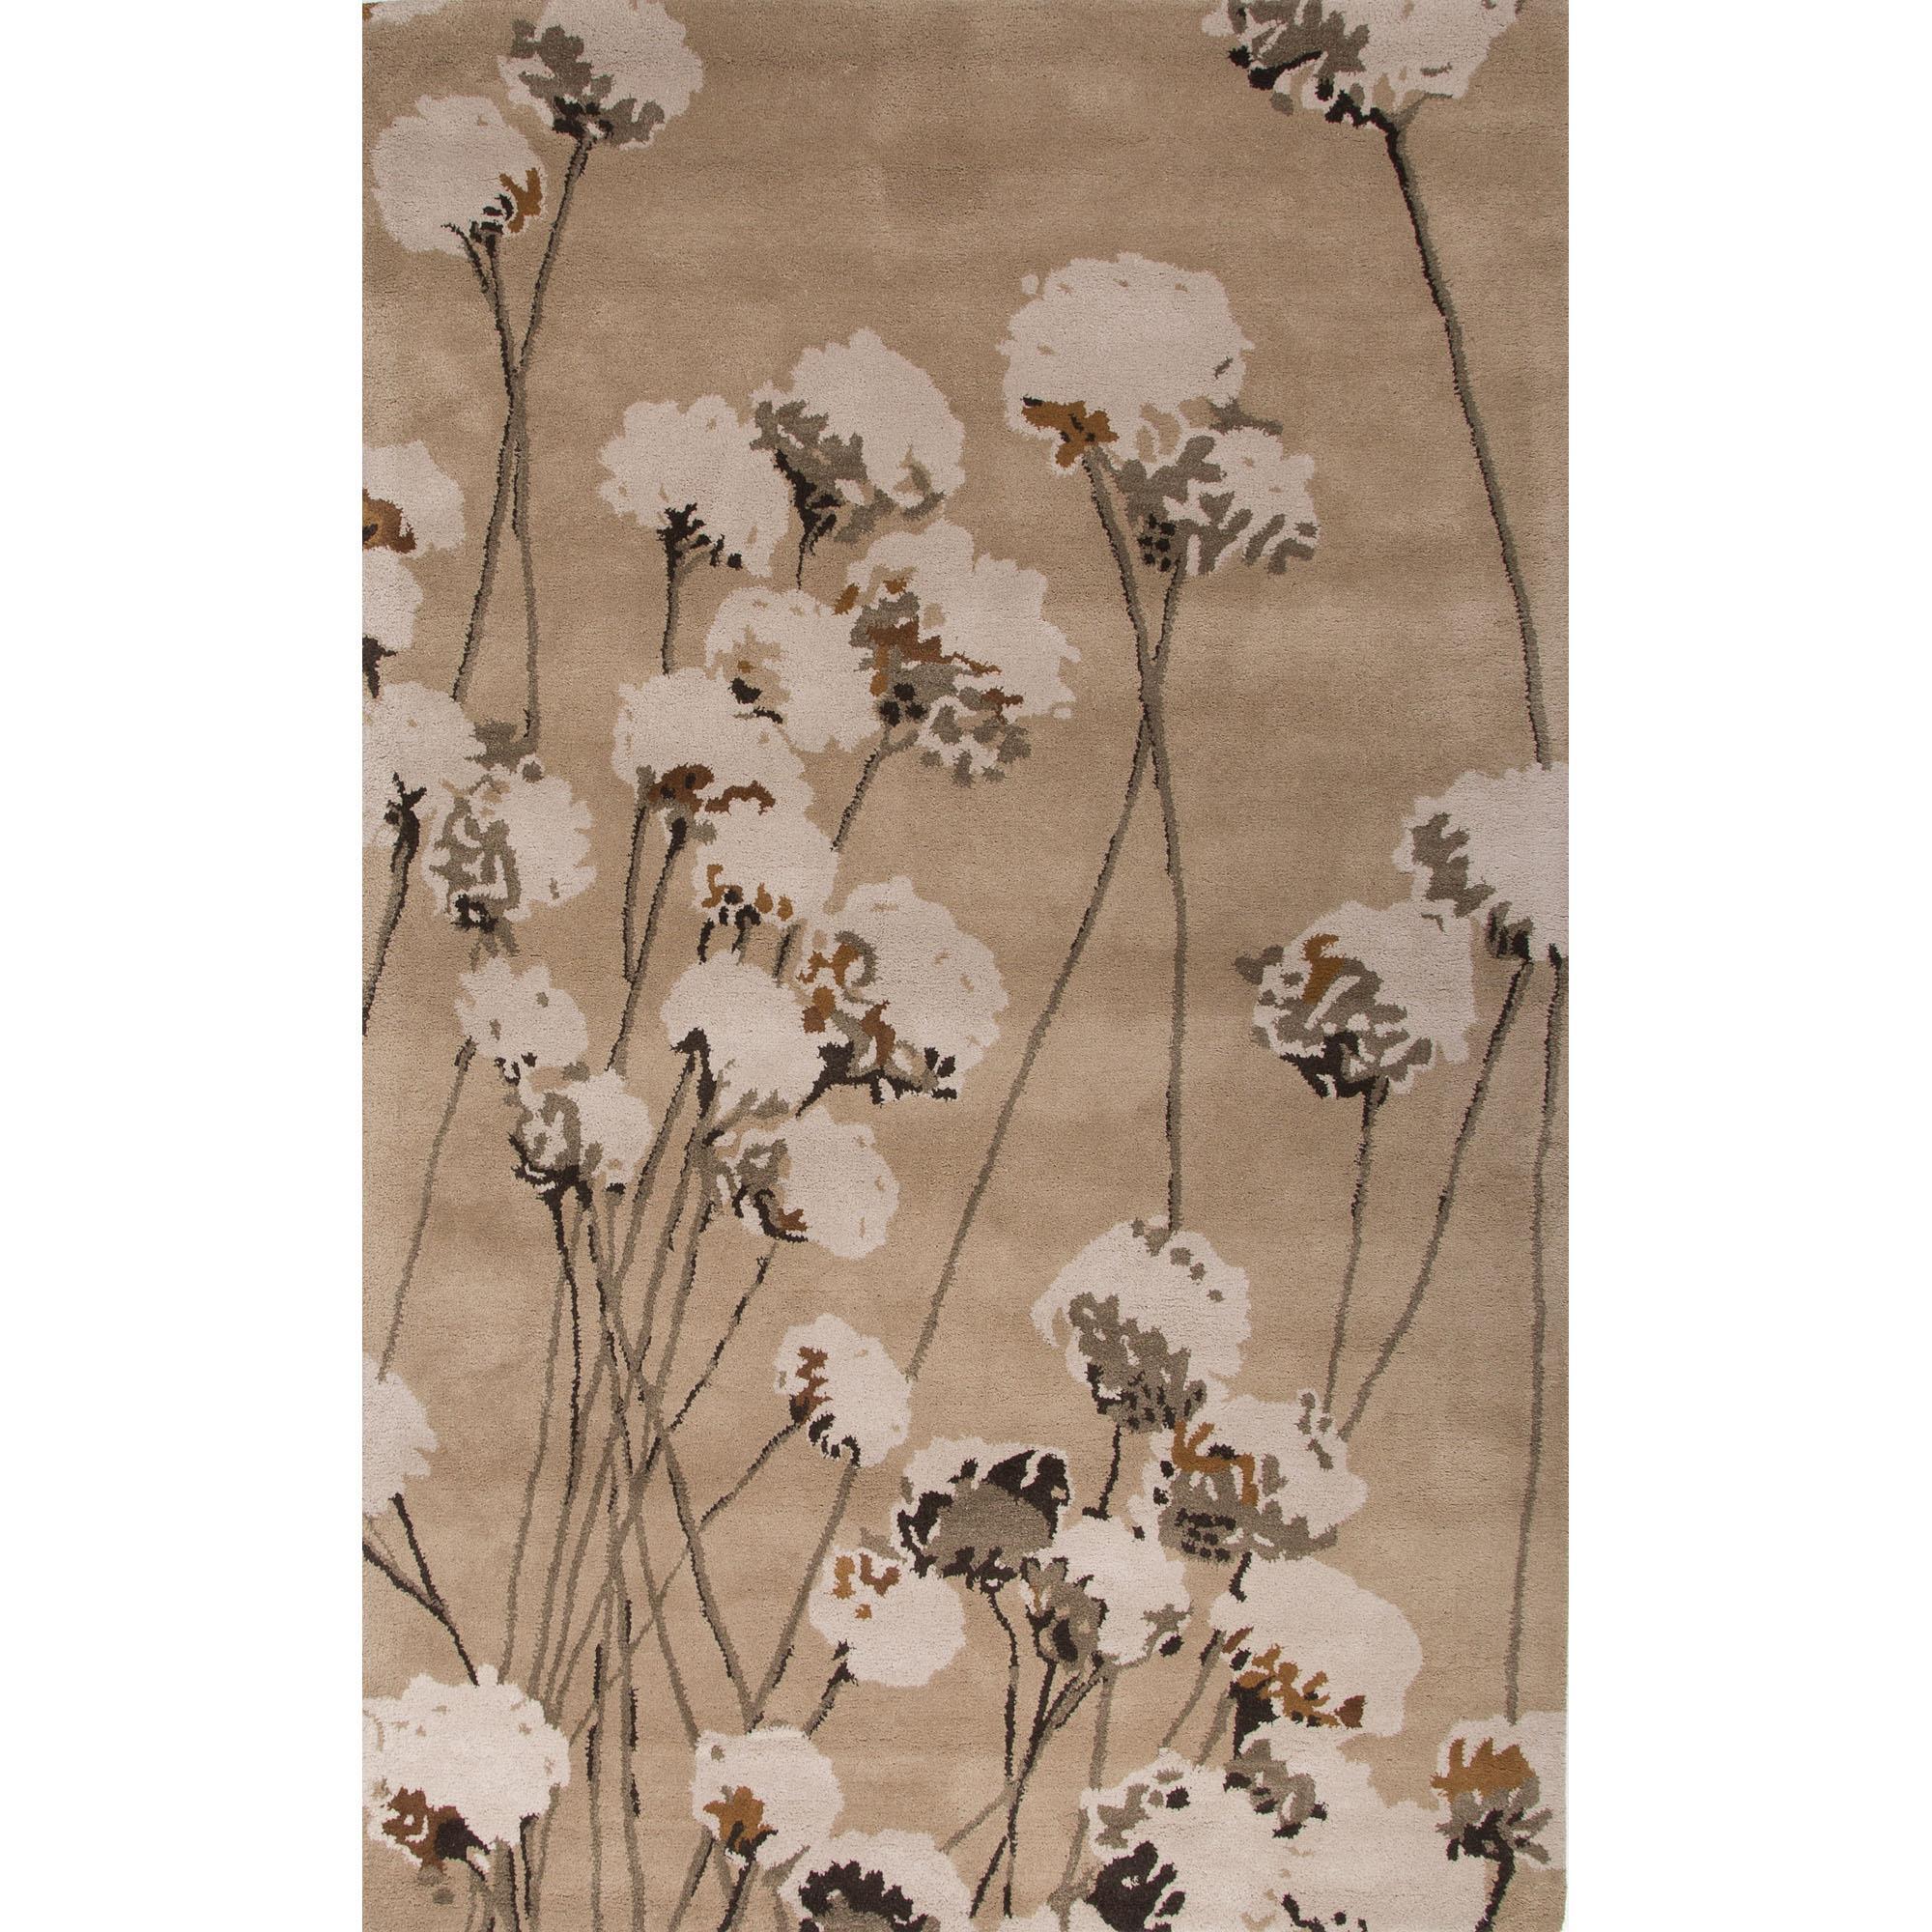 JAIPUR Rugs En Casa By Luli Sanchez Tufted 8 x 11 Rug - Item Number: RUG116815